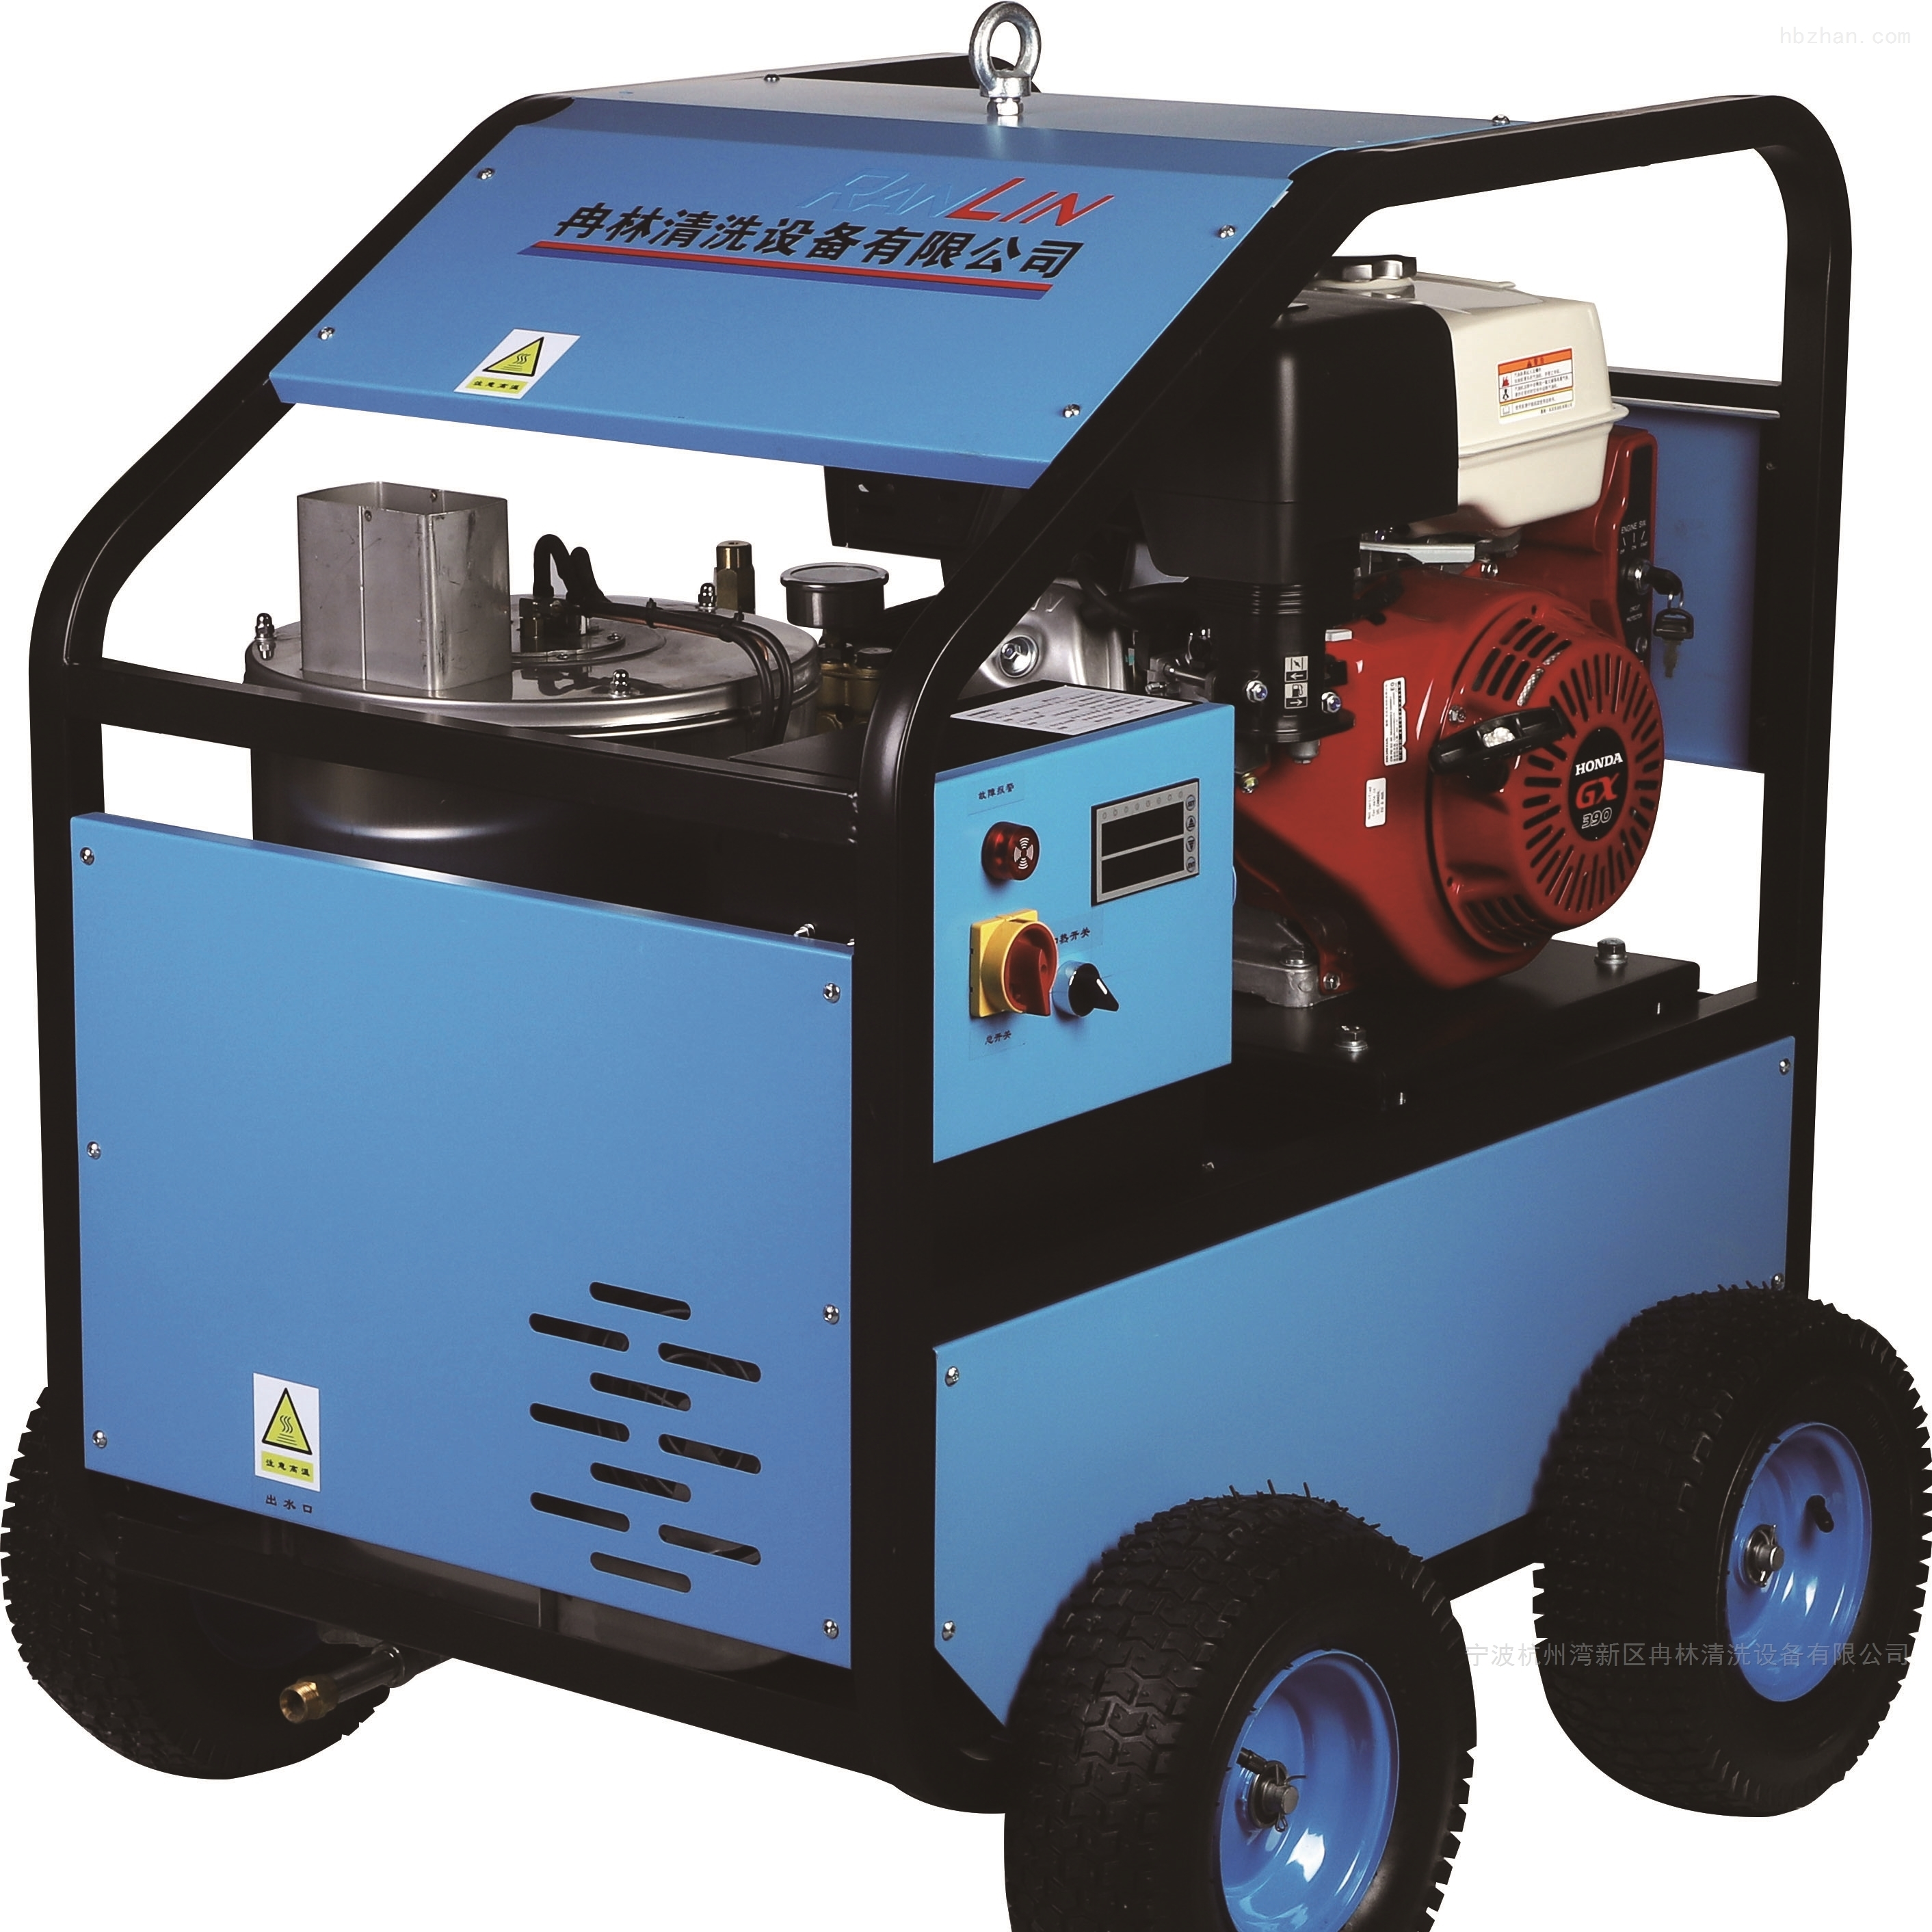 CAYR2515-E型汽油机驱动高压热水清洗机